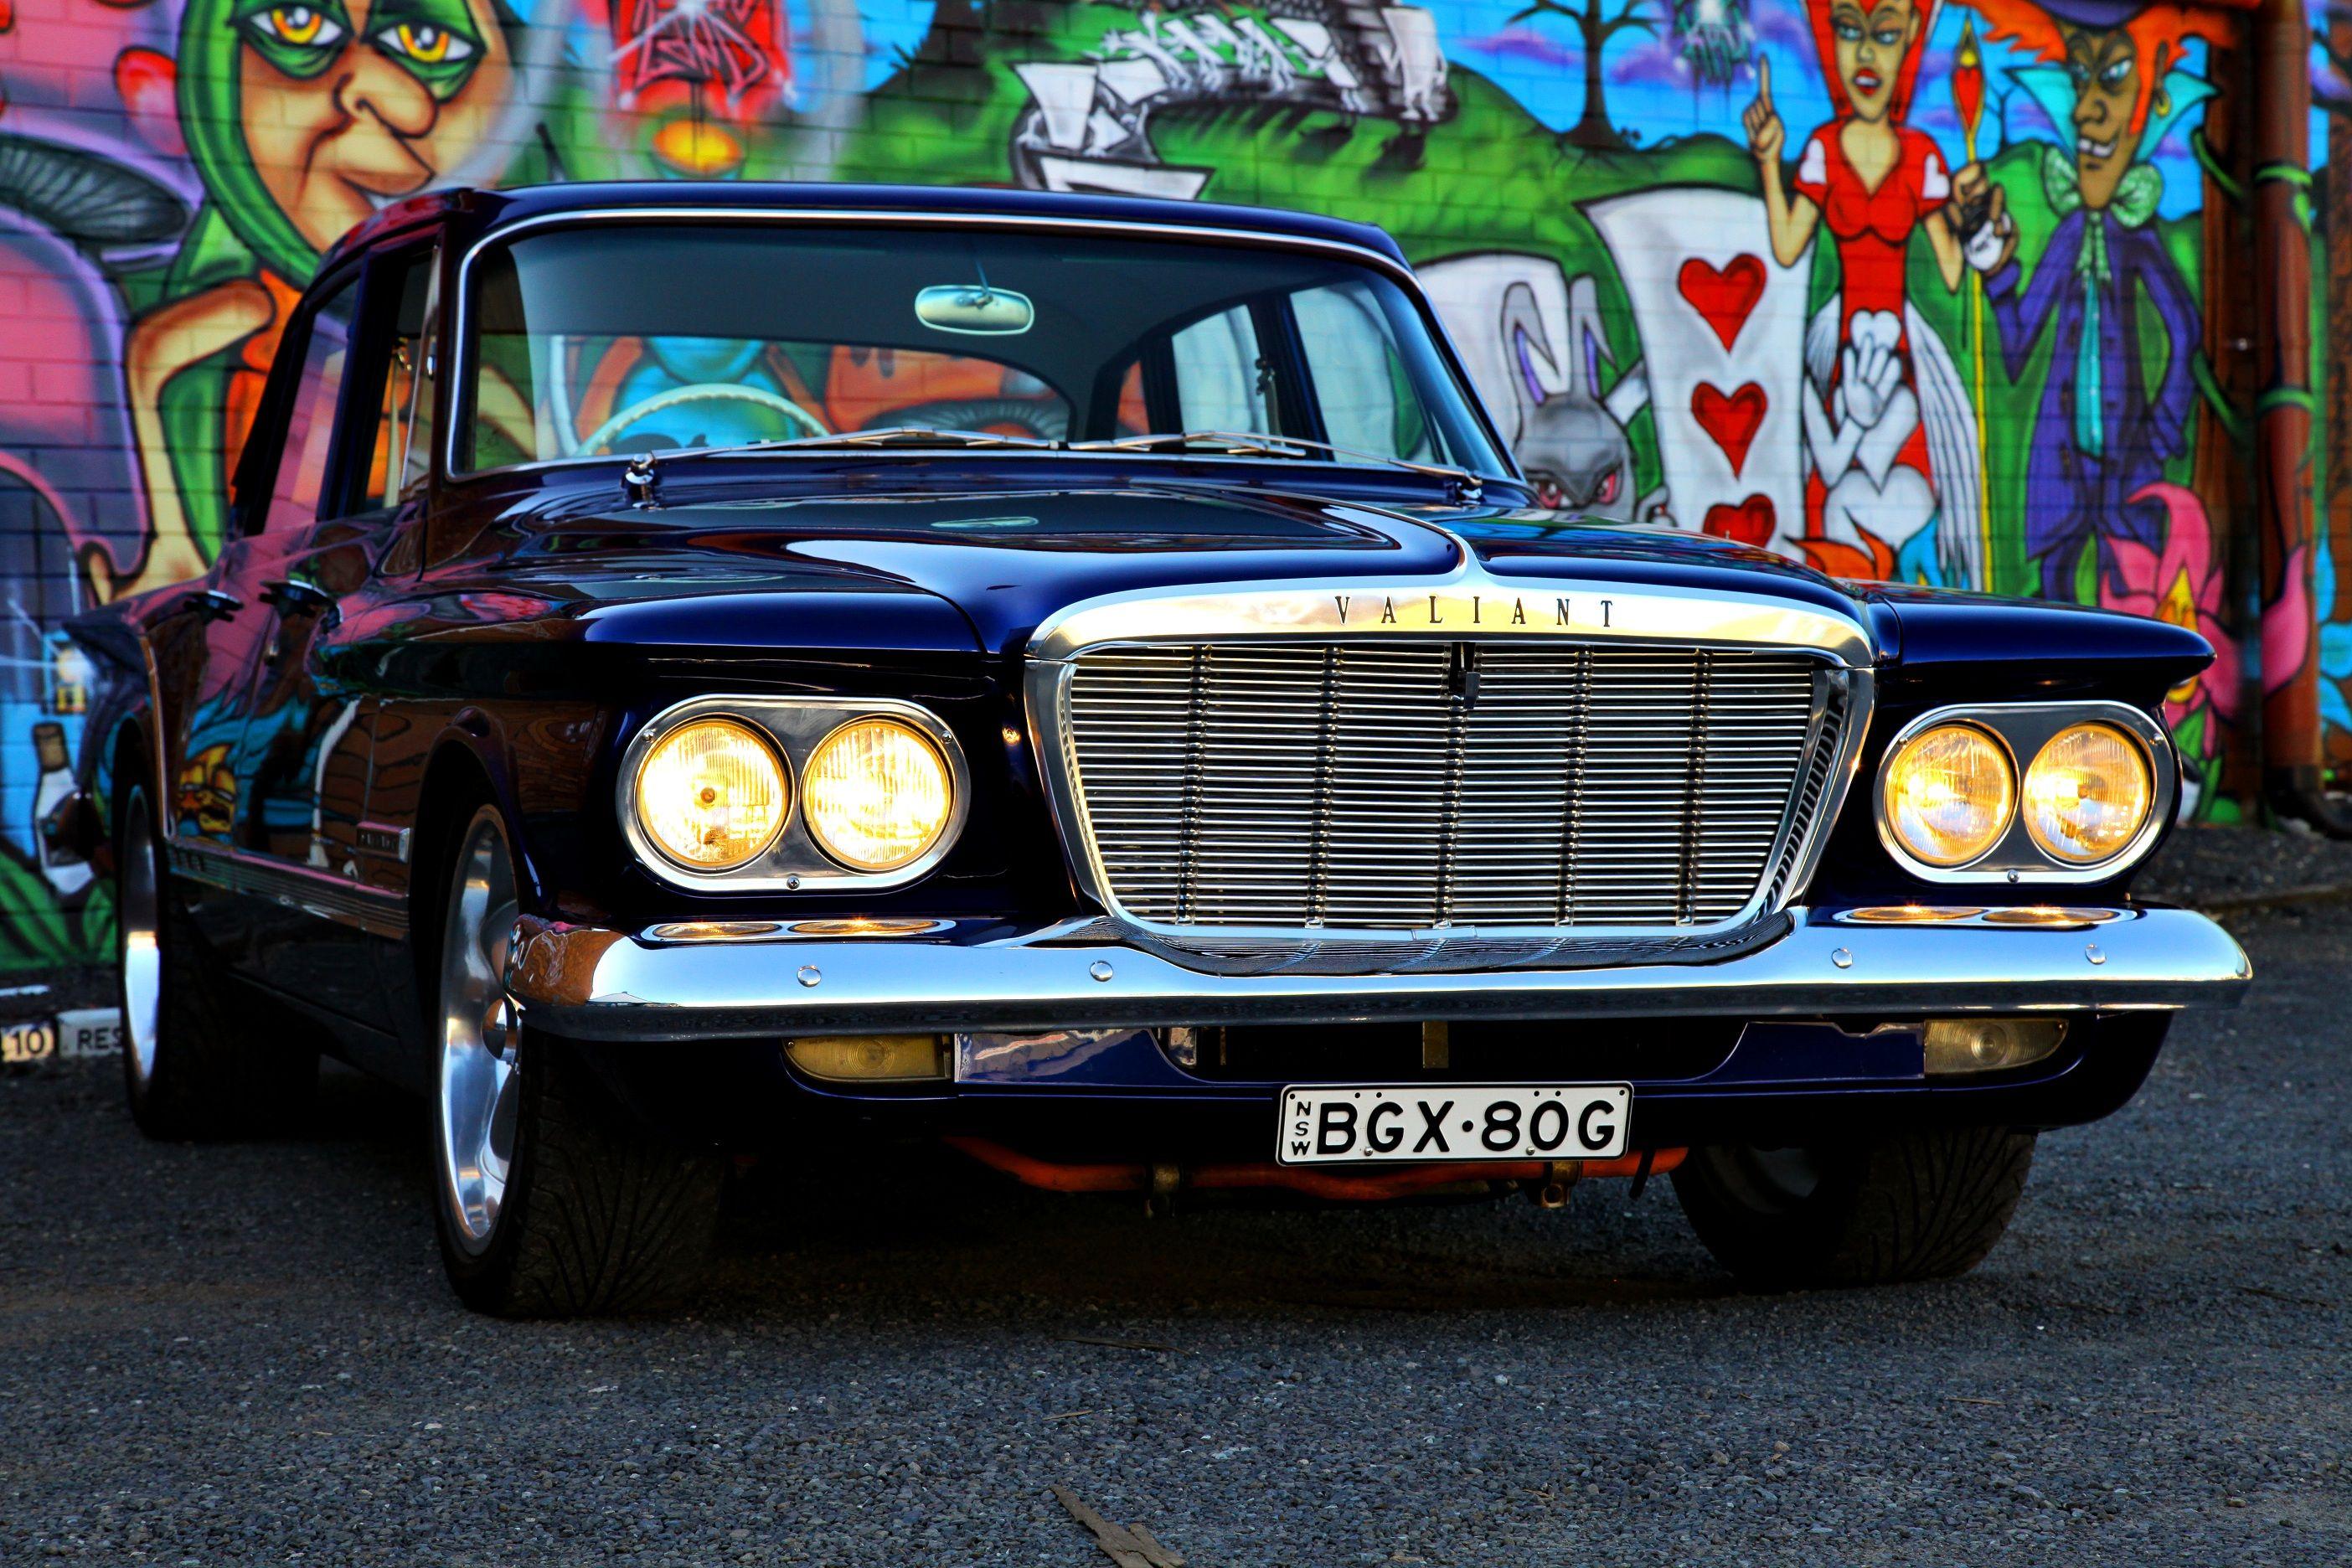 S series valiant 1962 chrysler valiant 1962 s series pinterest mopar cars and plymouth